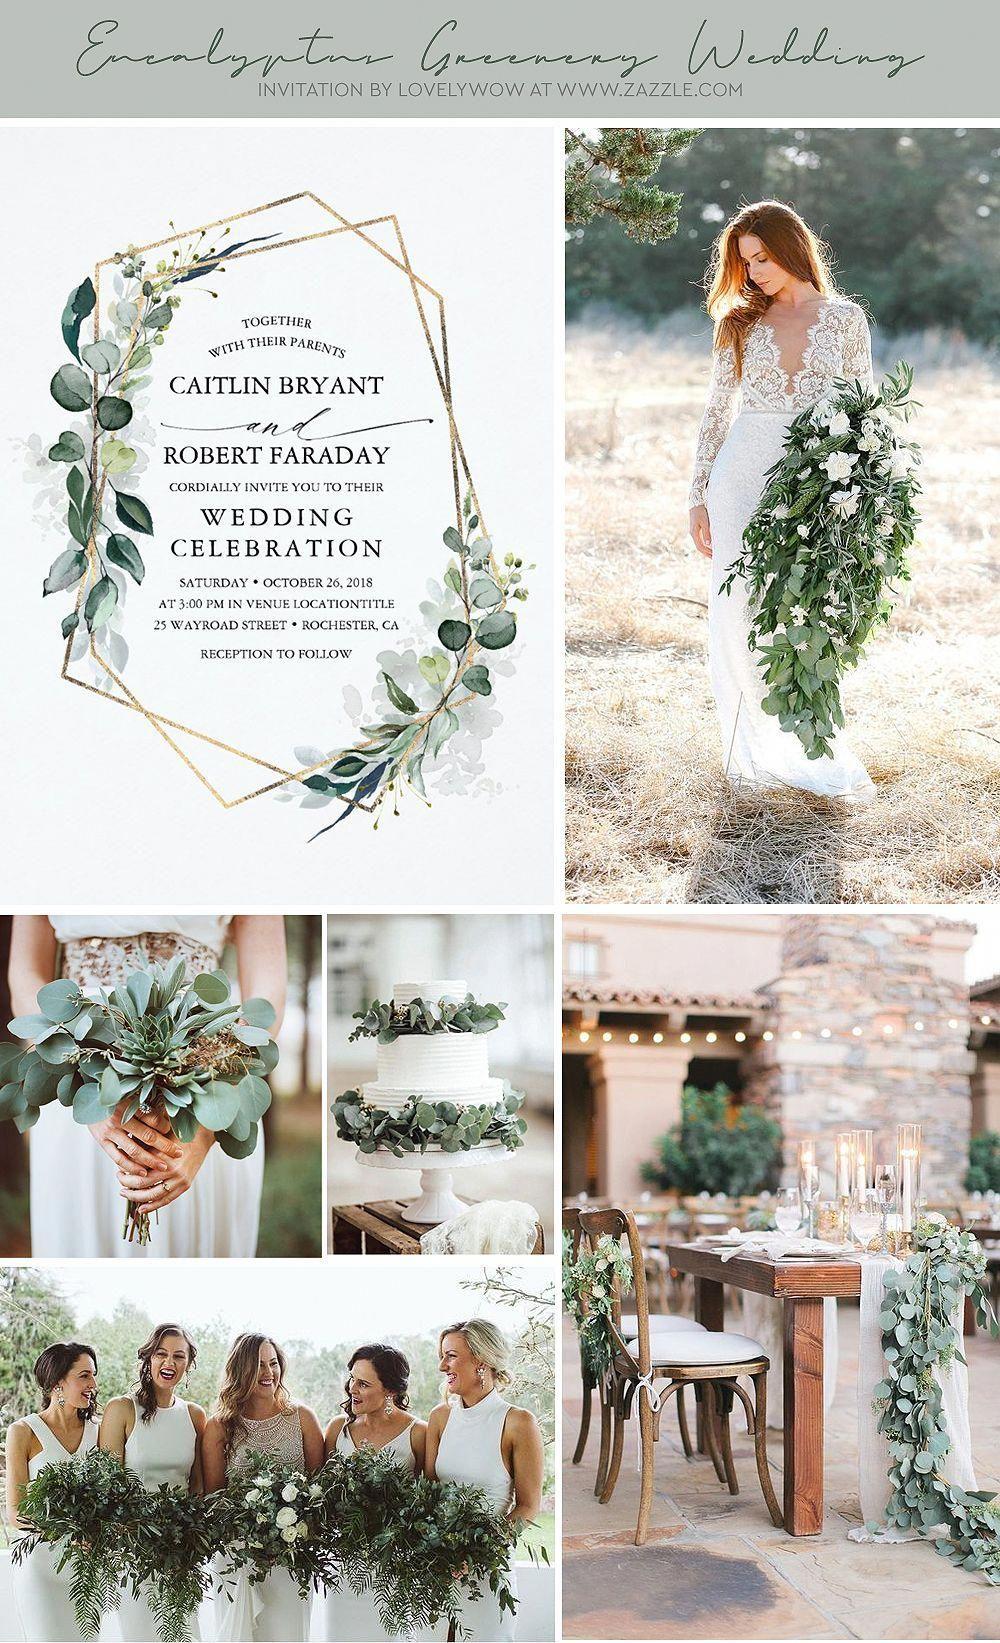 Eucalyptus Greenery Geometric Modern Wedding Invitation | Zazzle.com